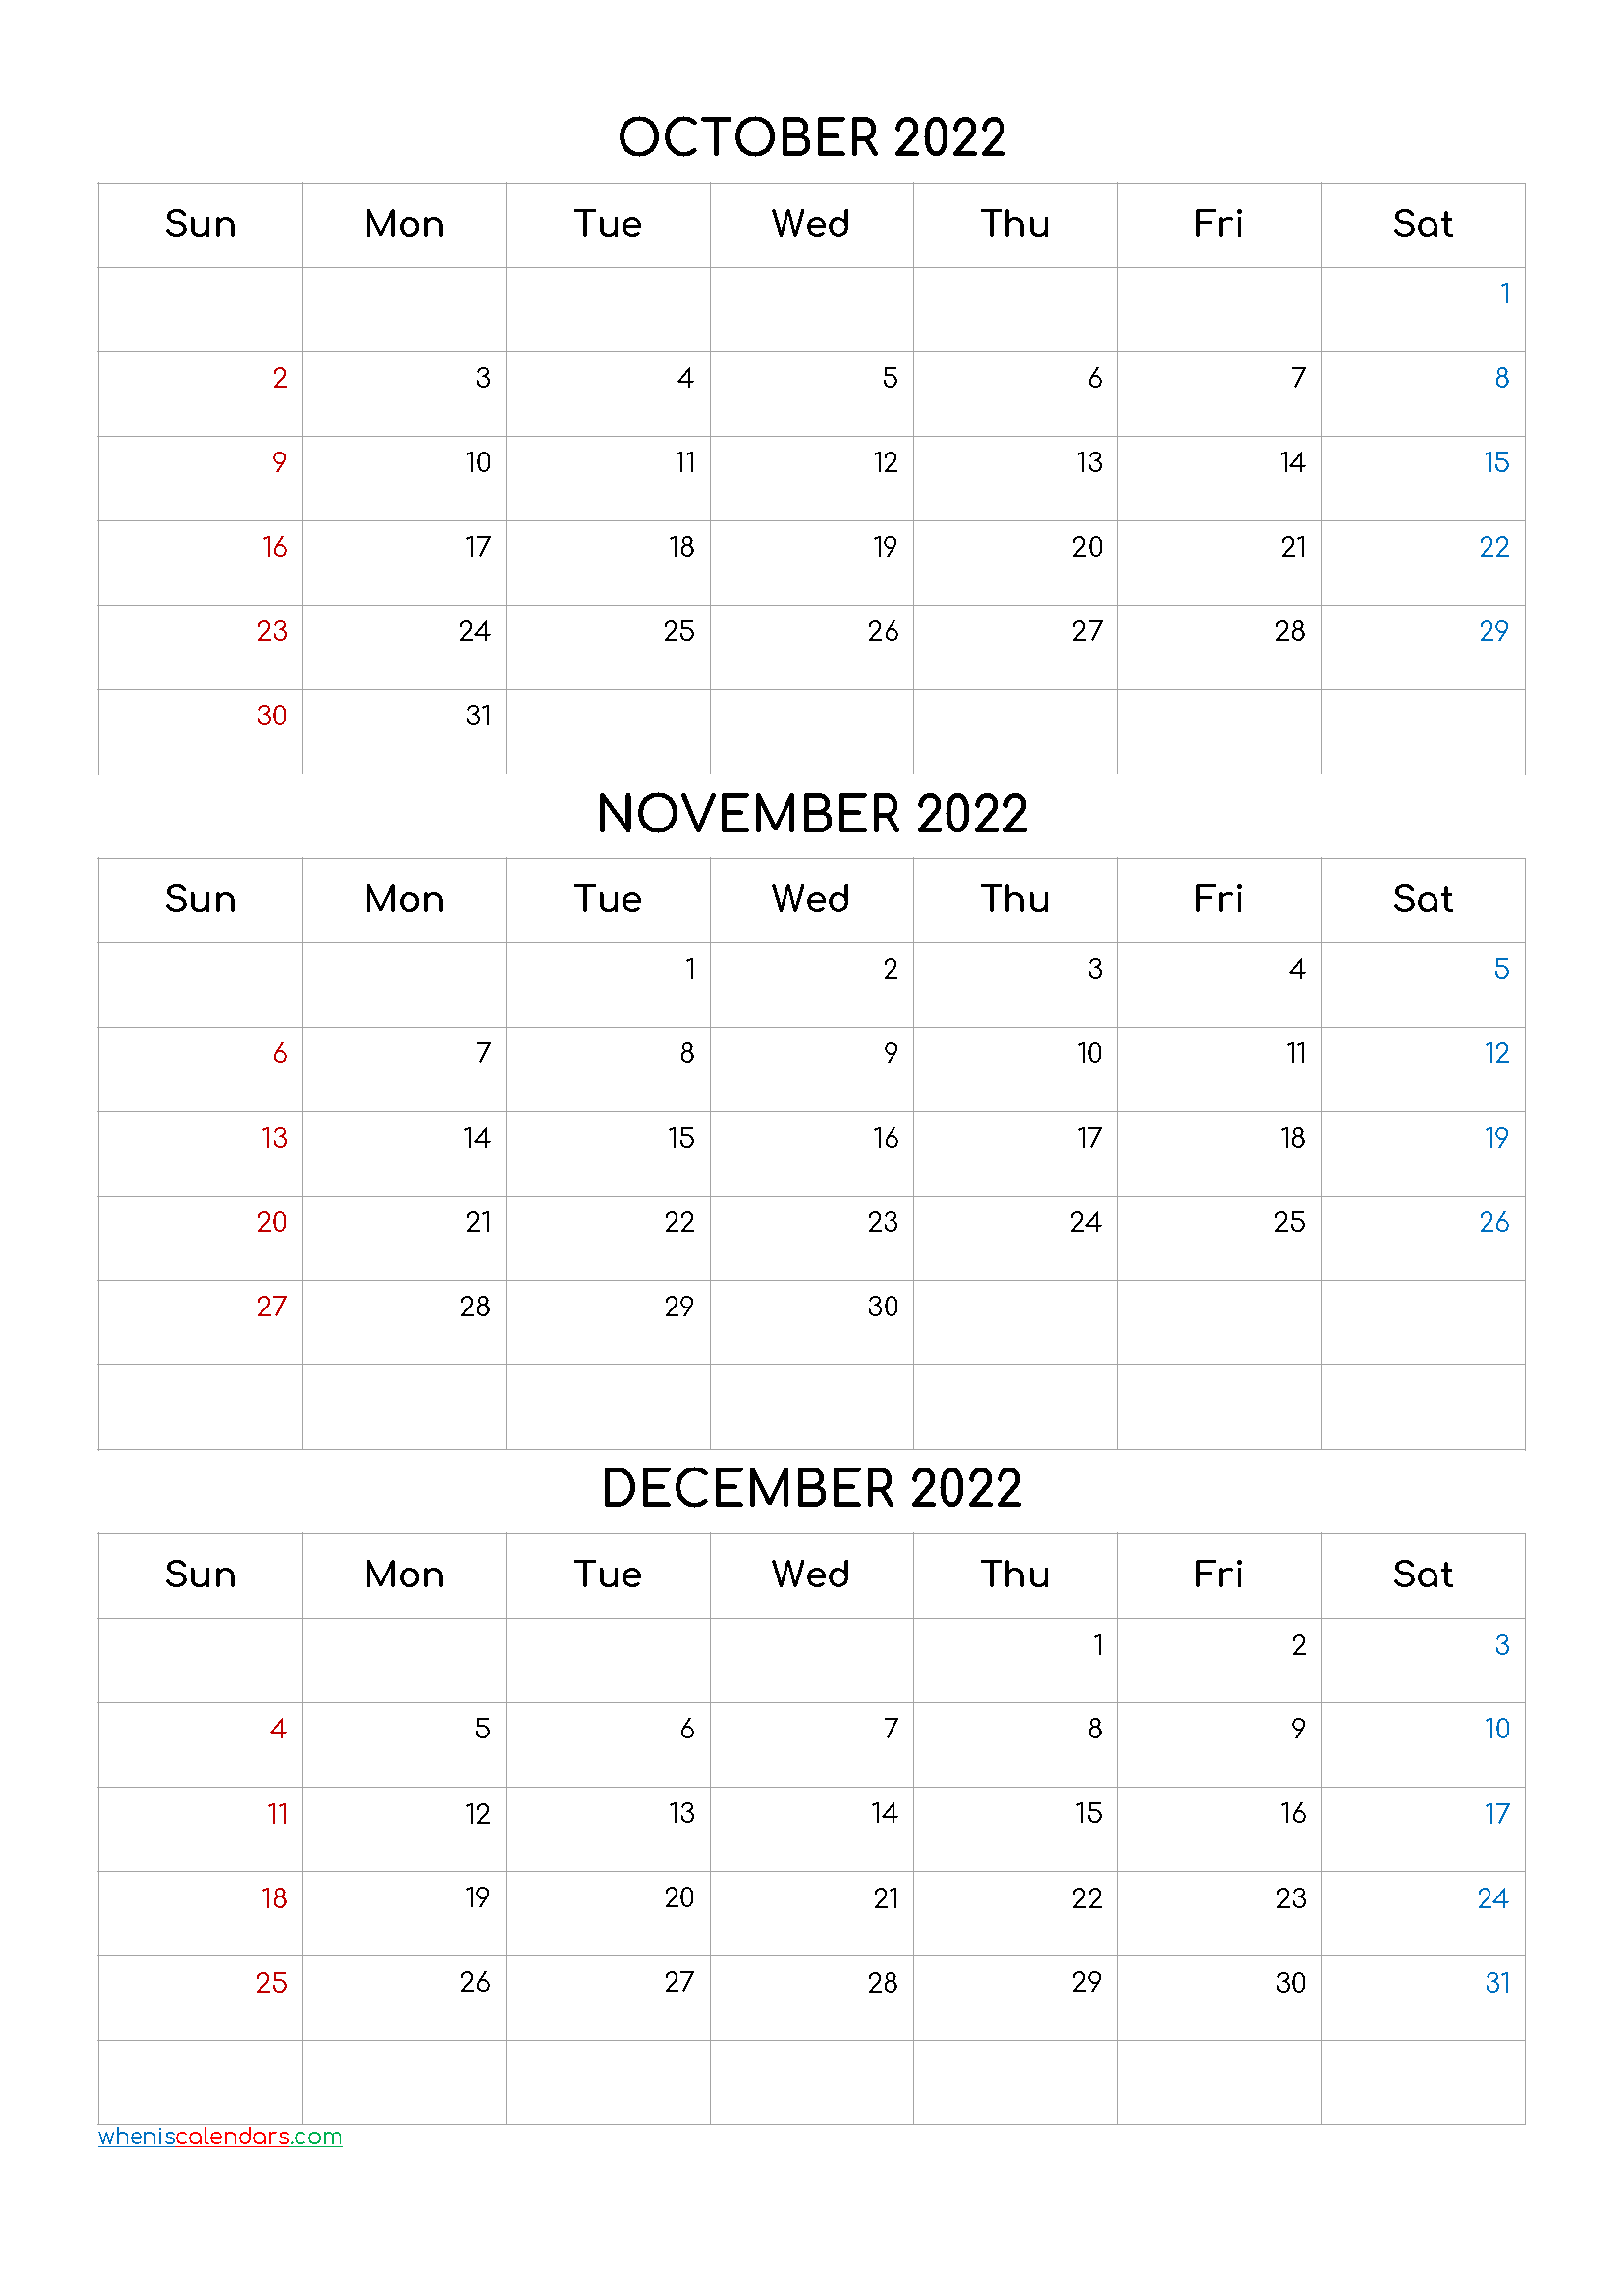 December 2022 Calendar Printable Free.October November December 2022 Calendar Printable Free Q1 Q2 Q3 Q4 Calendar Printables Free Calendar Template Calendar Template